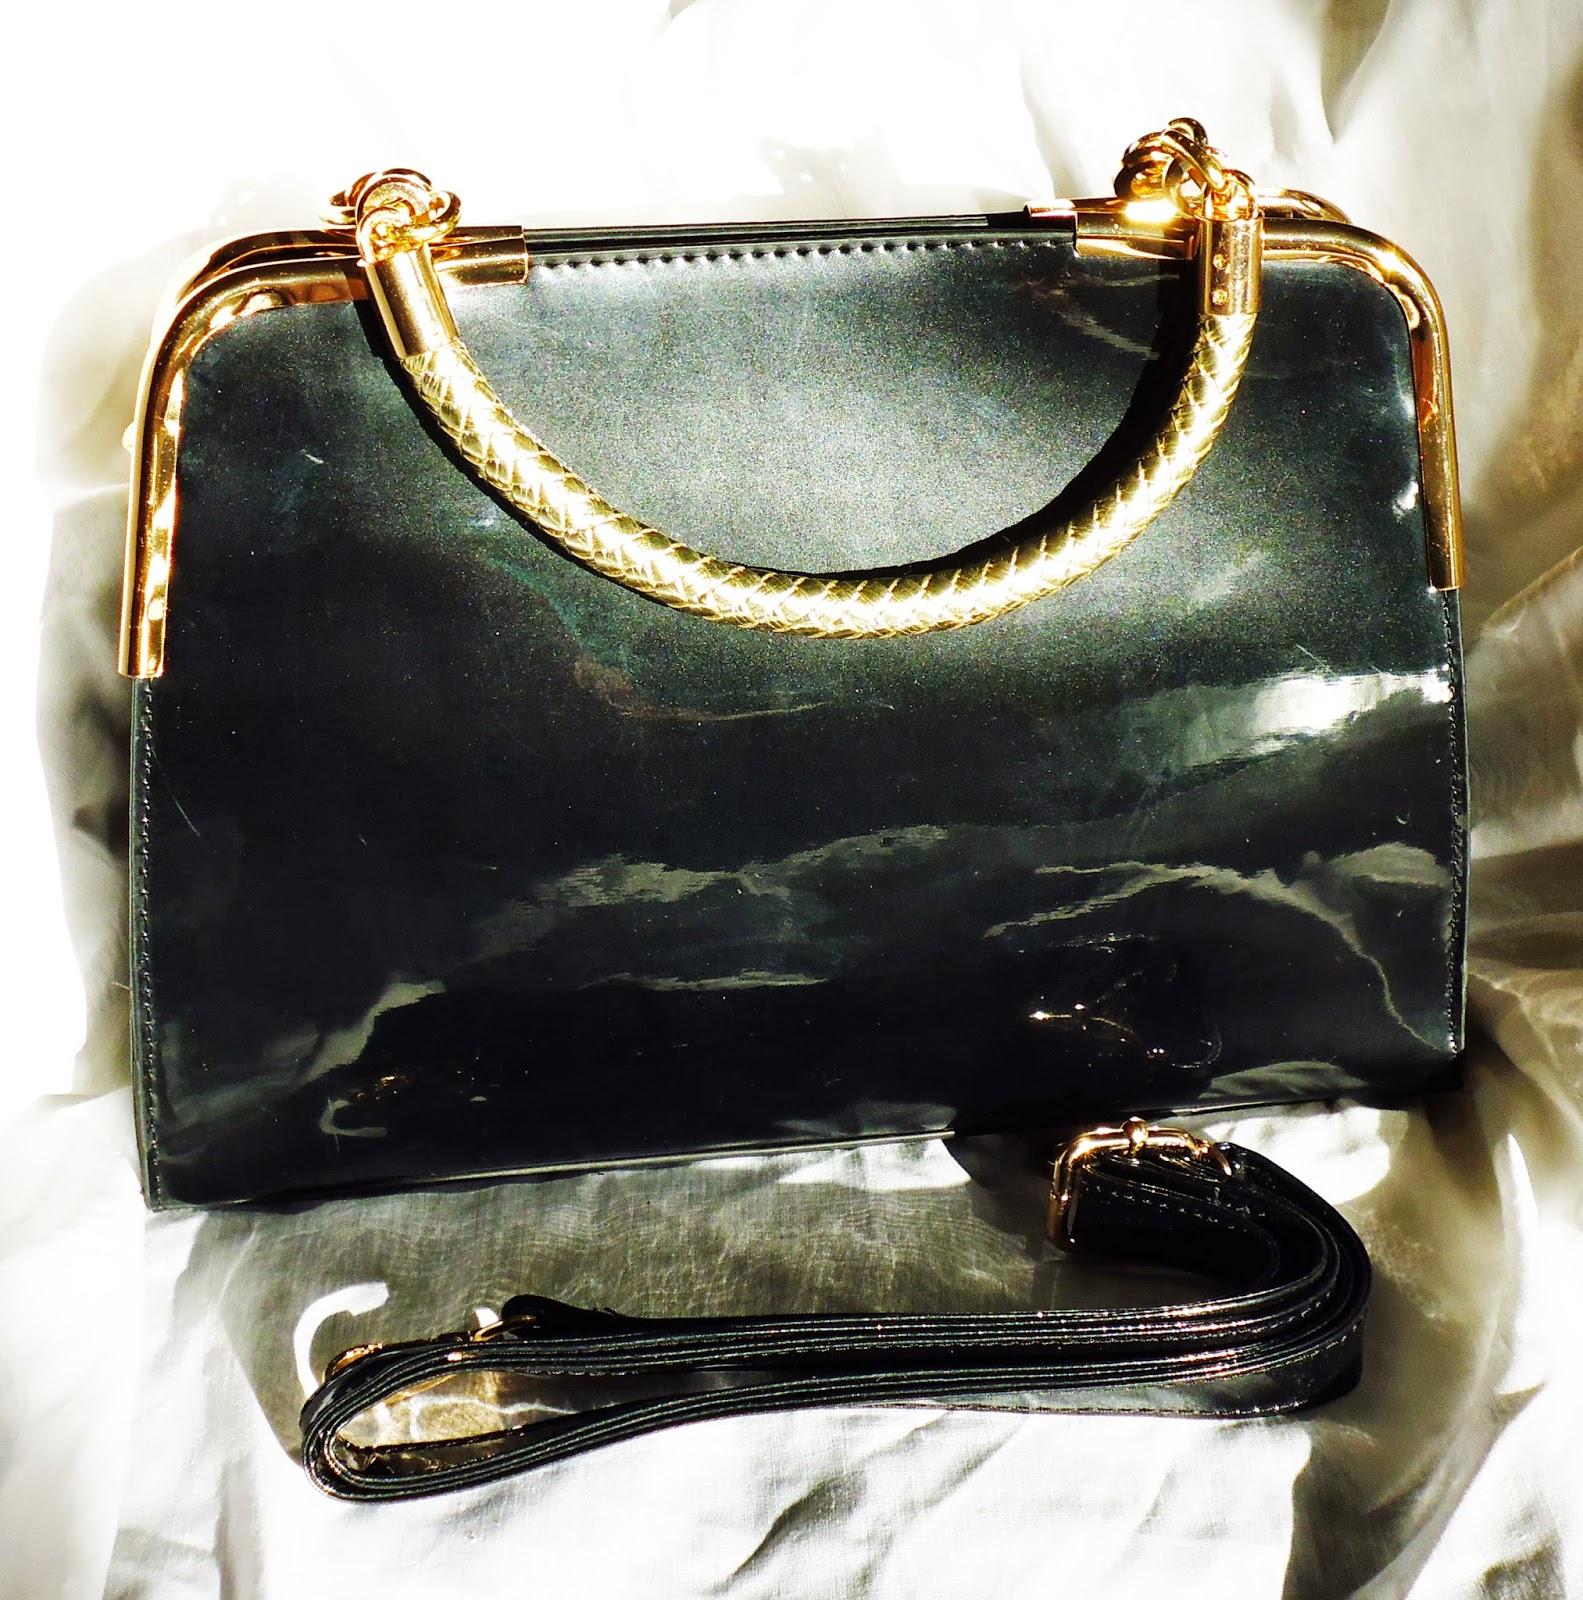 http://www.ebay.fr/itm/sac-a-main-feminin-raffine-vernis-noir-poignees-tressees-bijoux-dores-de-qualite-/301087859342?ssPageName=STRK:MESE:IT